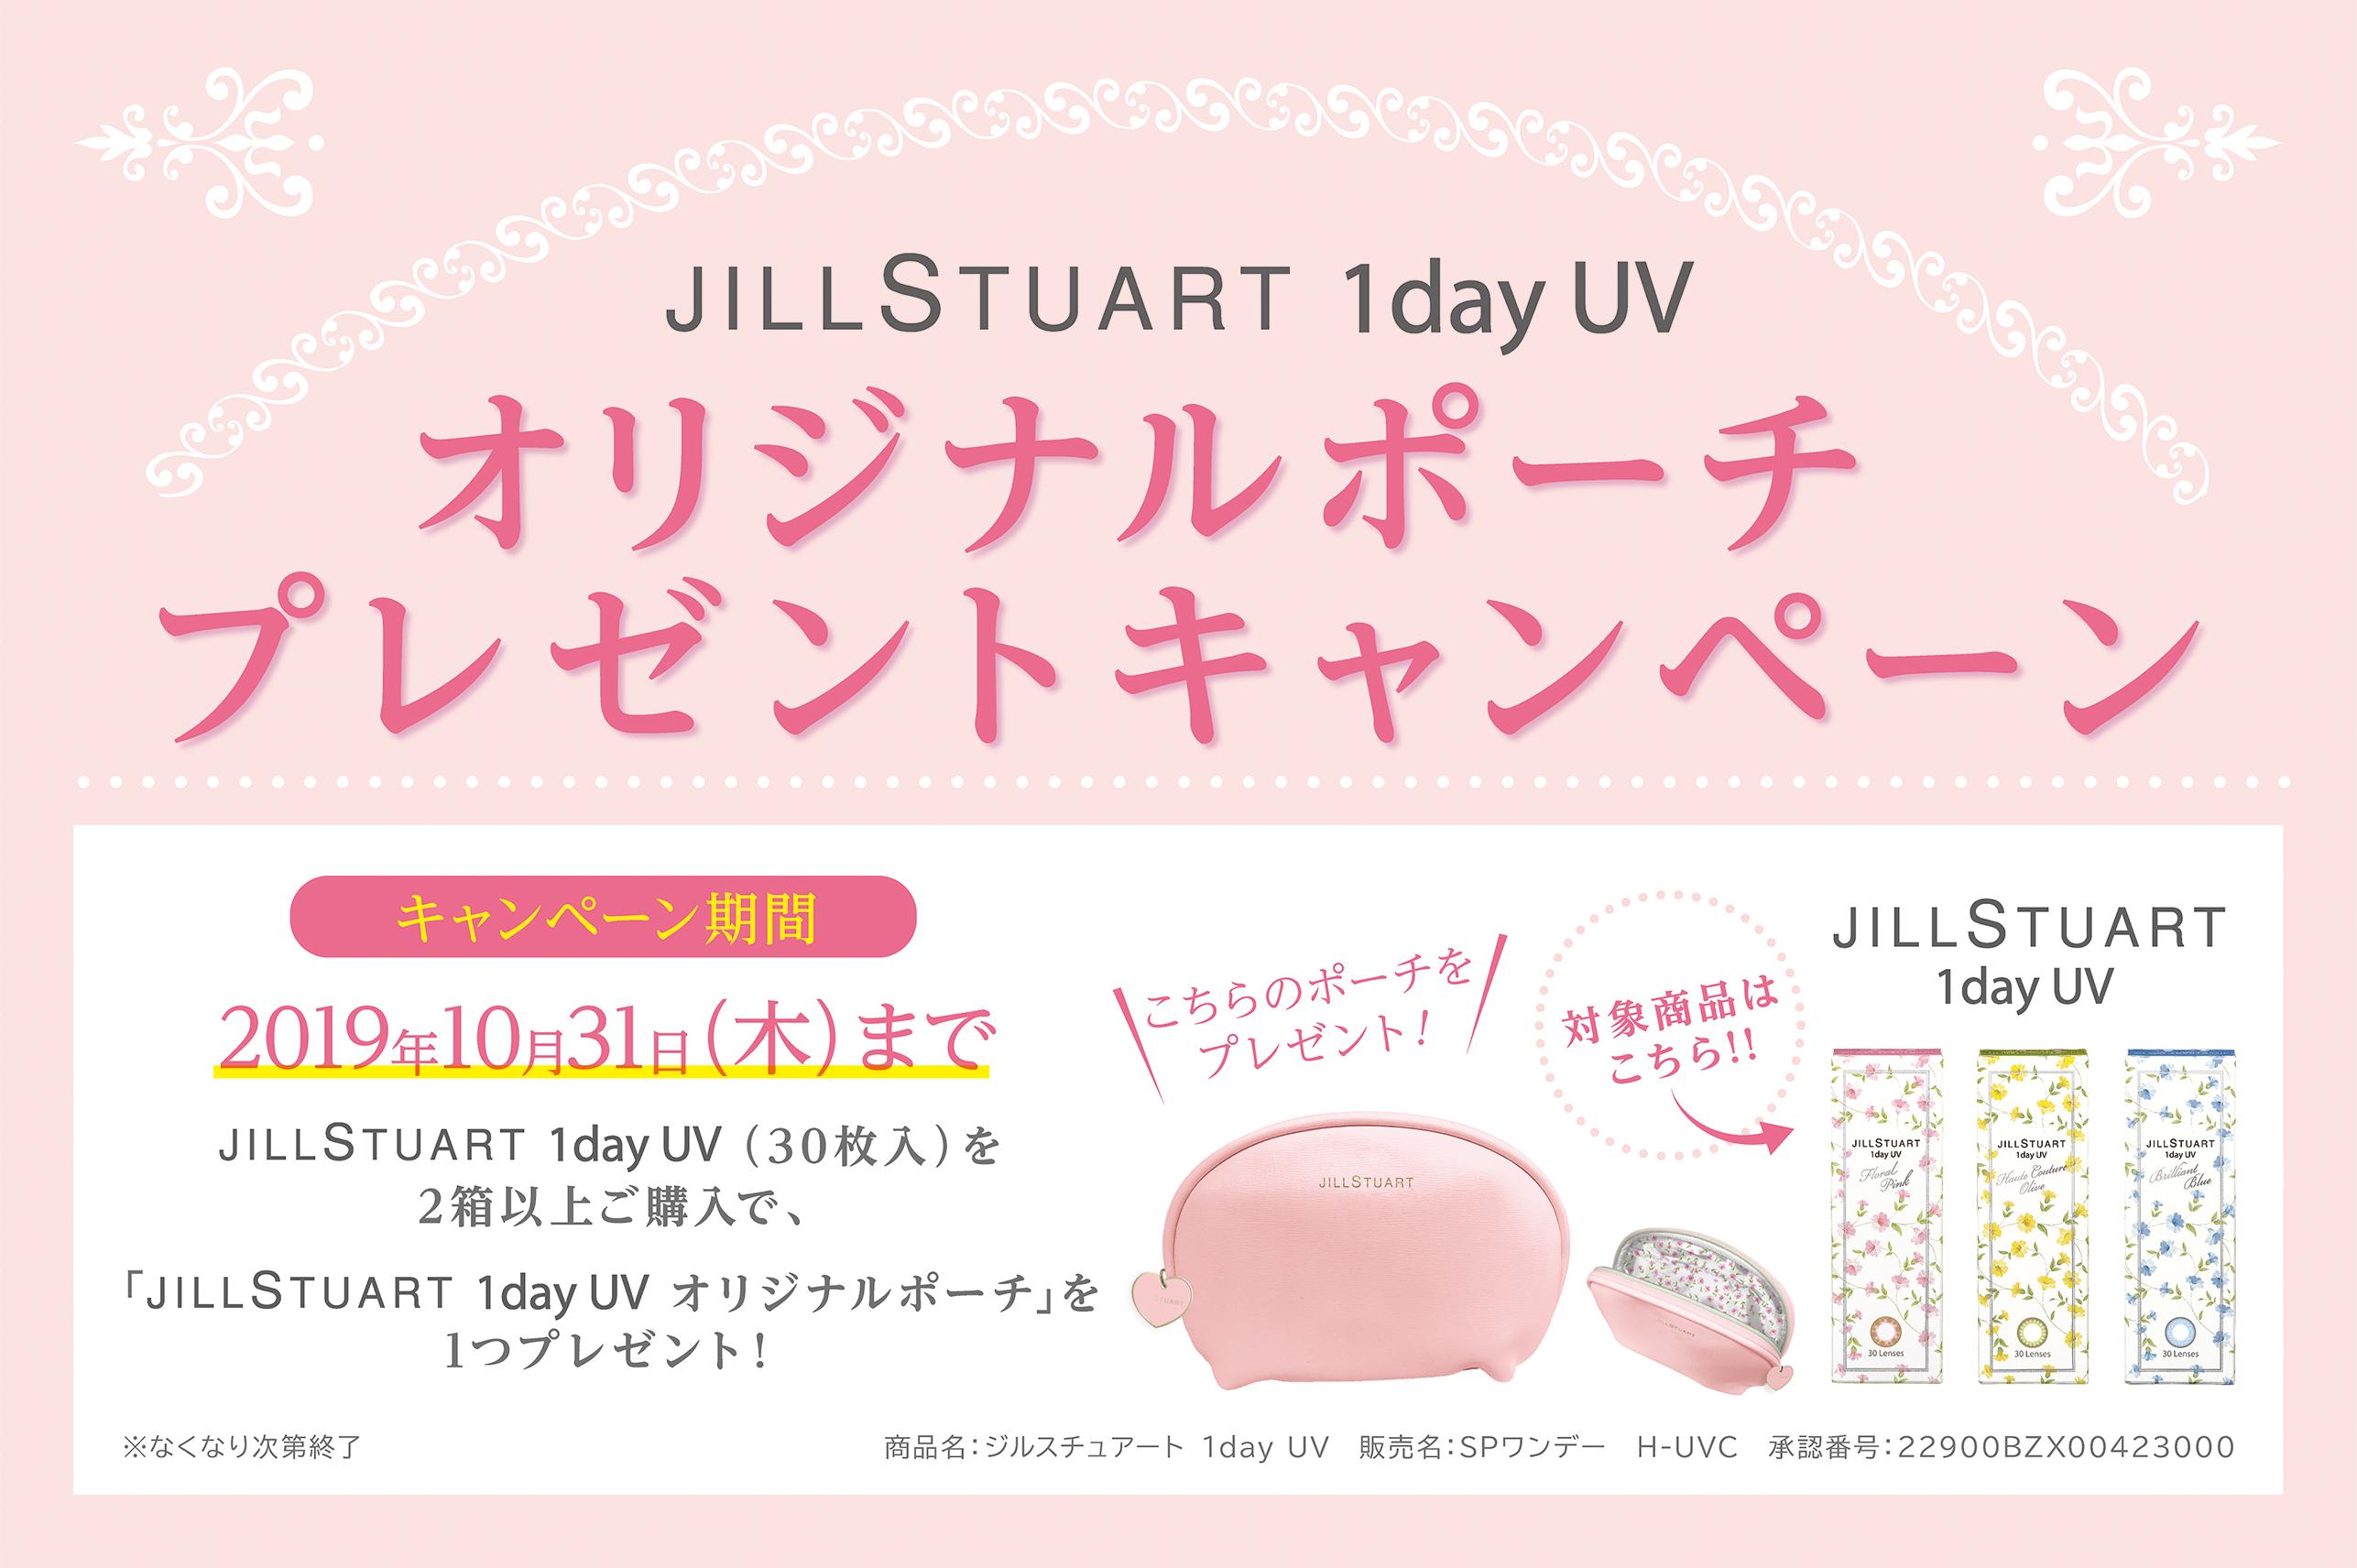 JILL STUART 1day UV オリジナルポーチプレゼント キャンペーン